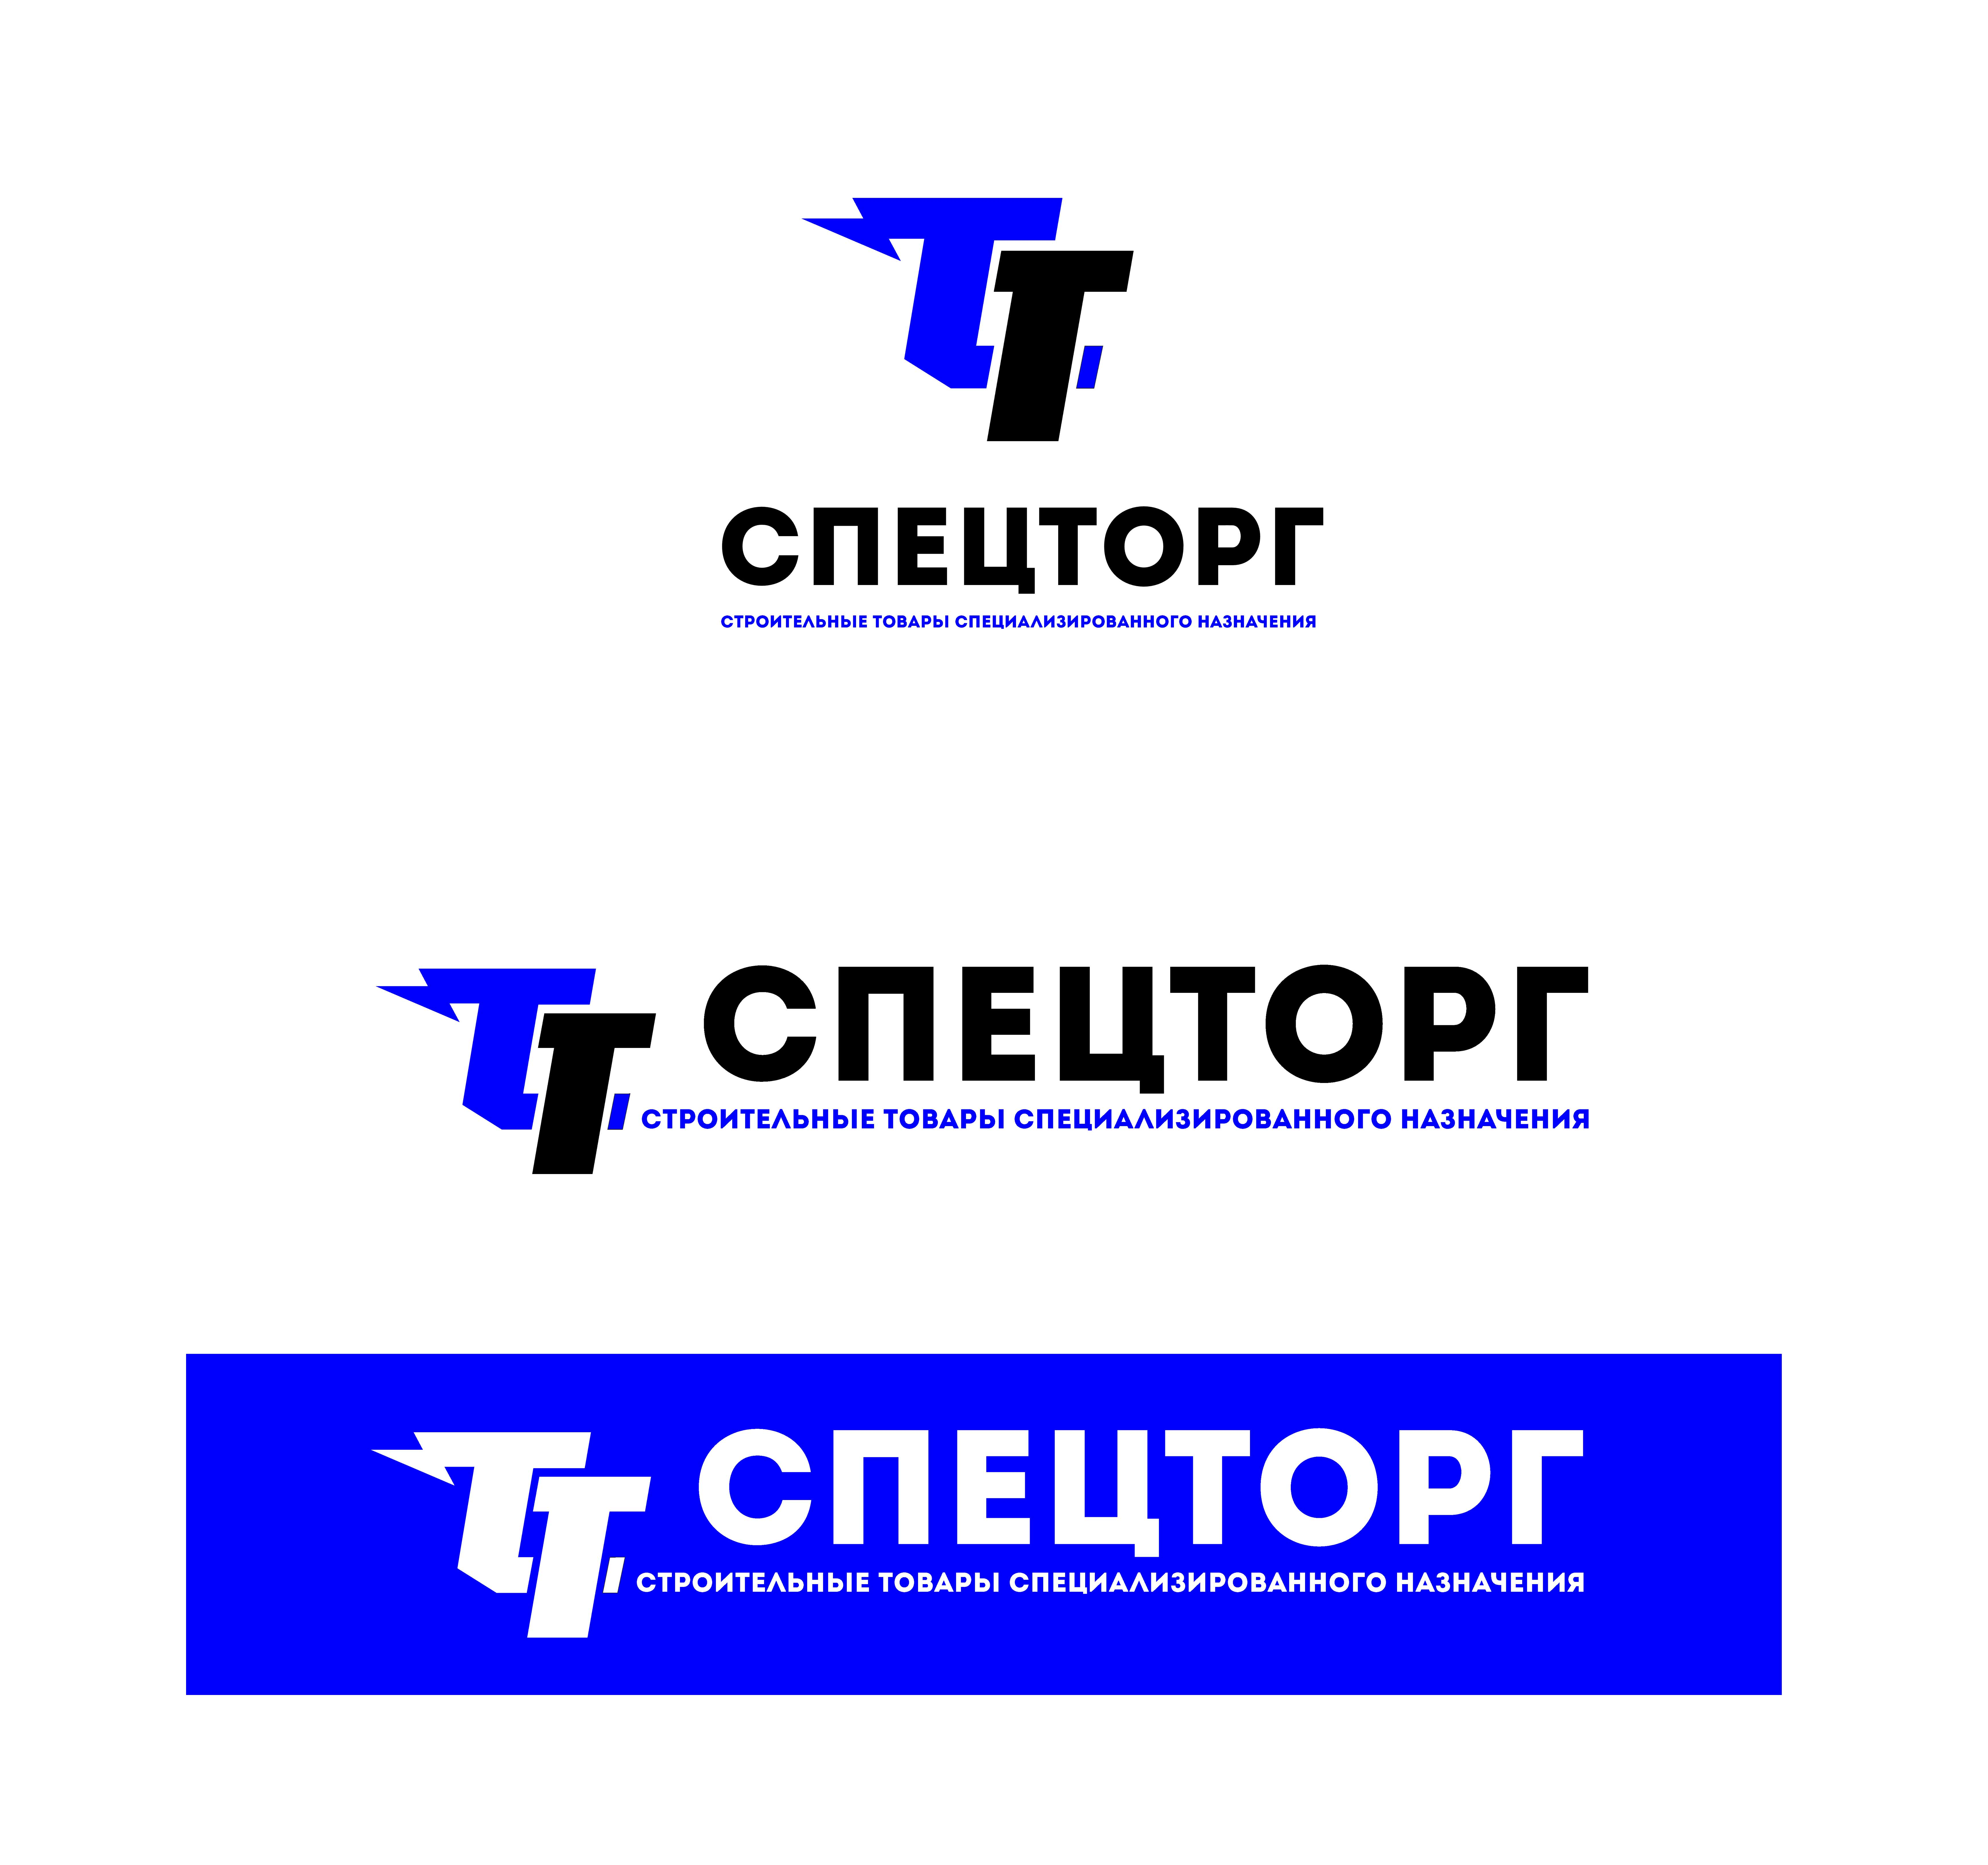 Разработать дизайн  логотипа компании фото f_7045dc40a1300165.jpg